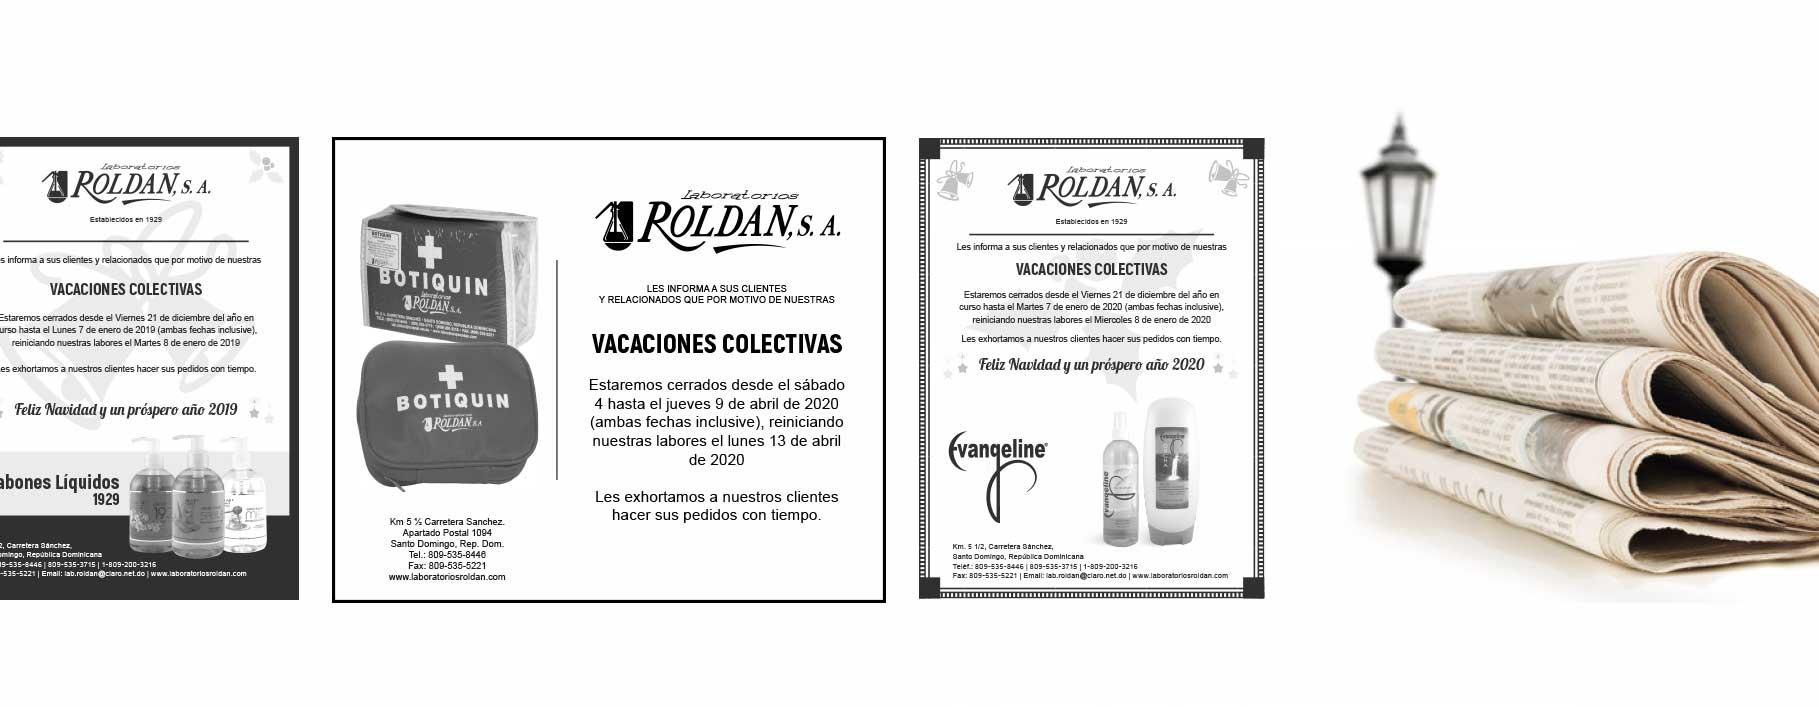 portfolio-roldan-newspaper